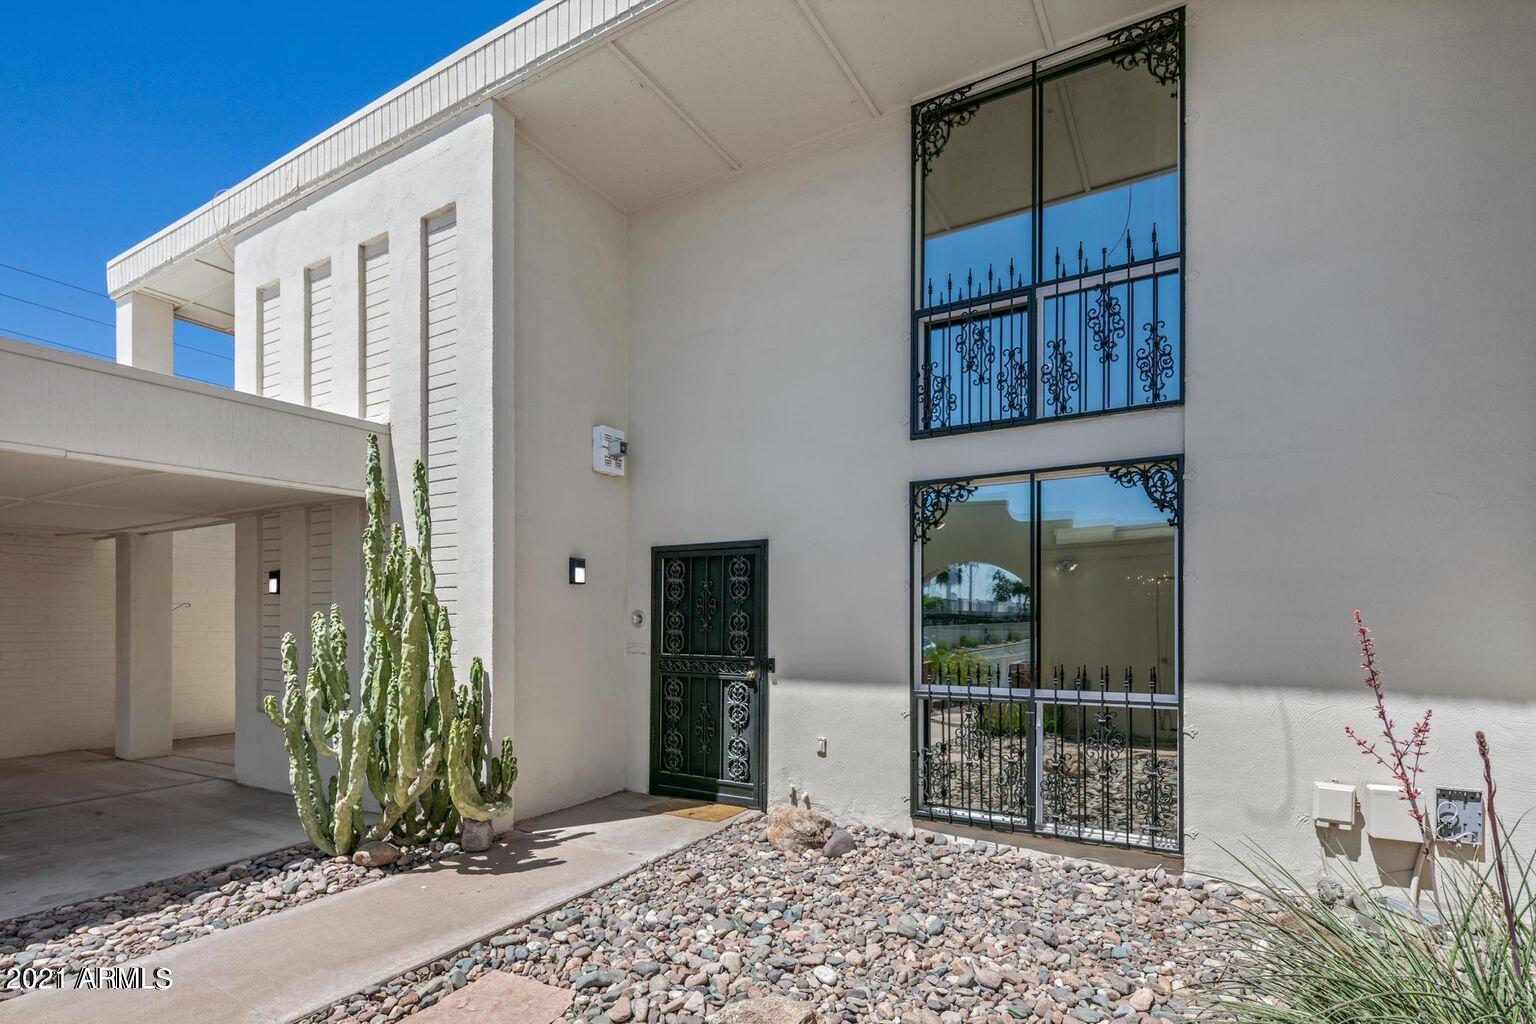 8602 E MACKENZIE Drive, Scottsdale, AZ 85251, 3 Bedrooms Bedrooms, ,Residential Lease,For Rent,8602 E MACKENZIE Drive,6256802